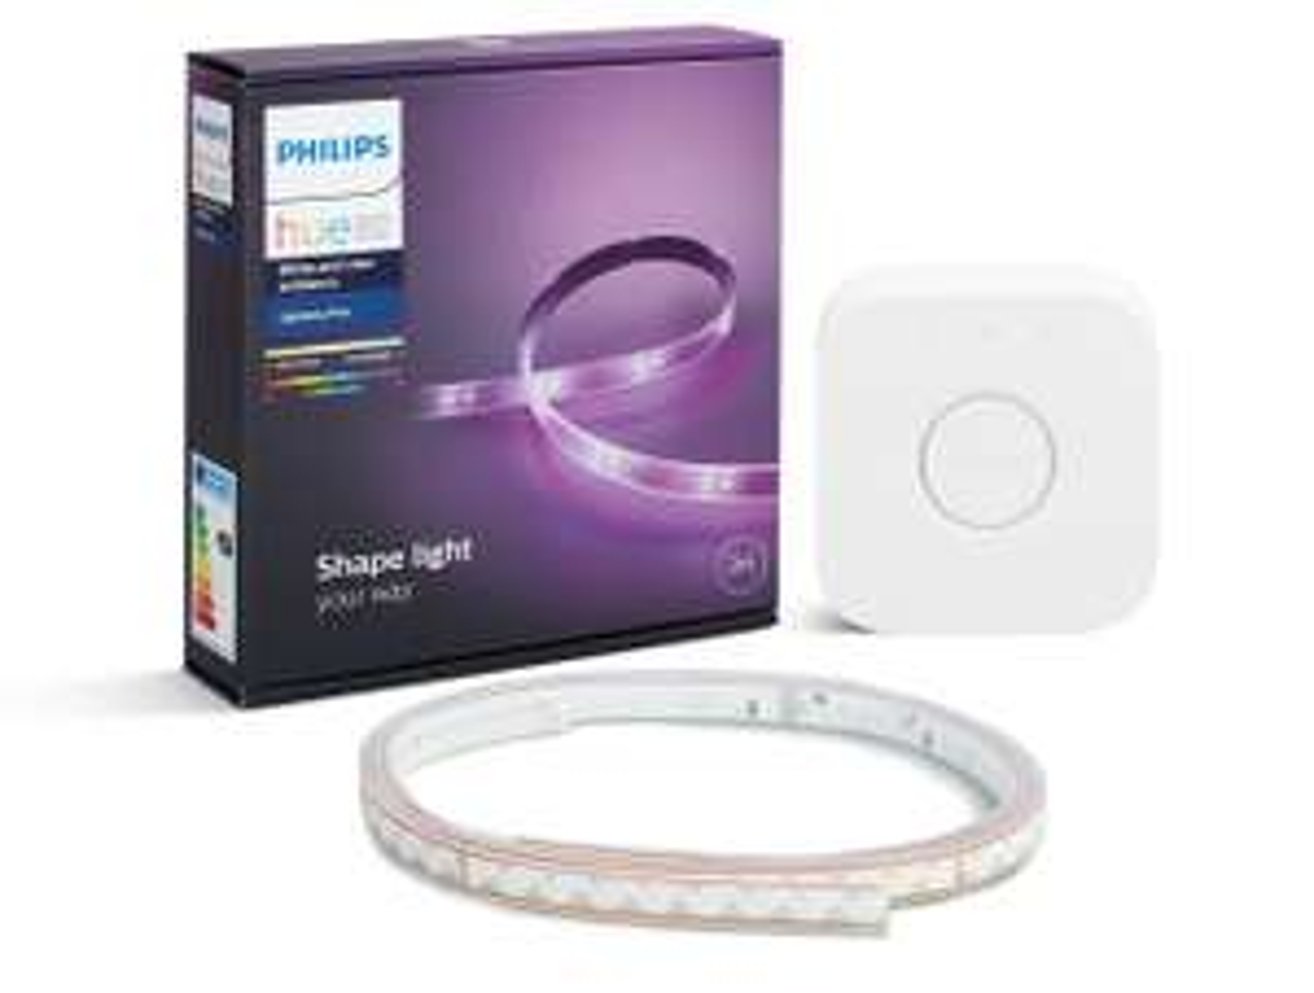 Philips  Hue Personal Wireless Lighting 2m Lightstrip with Bridge £74.99 Amazon